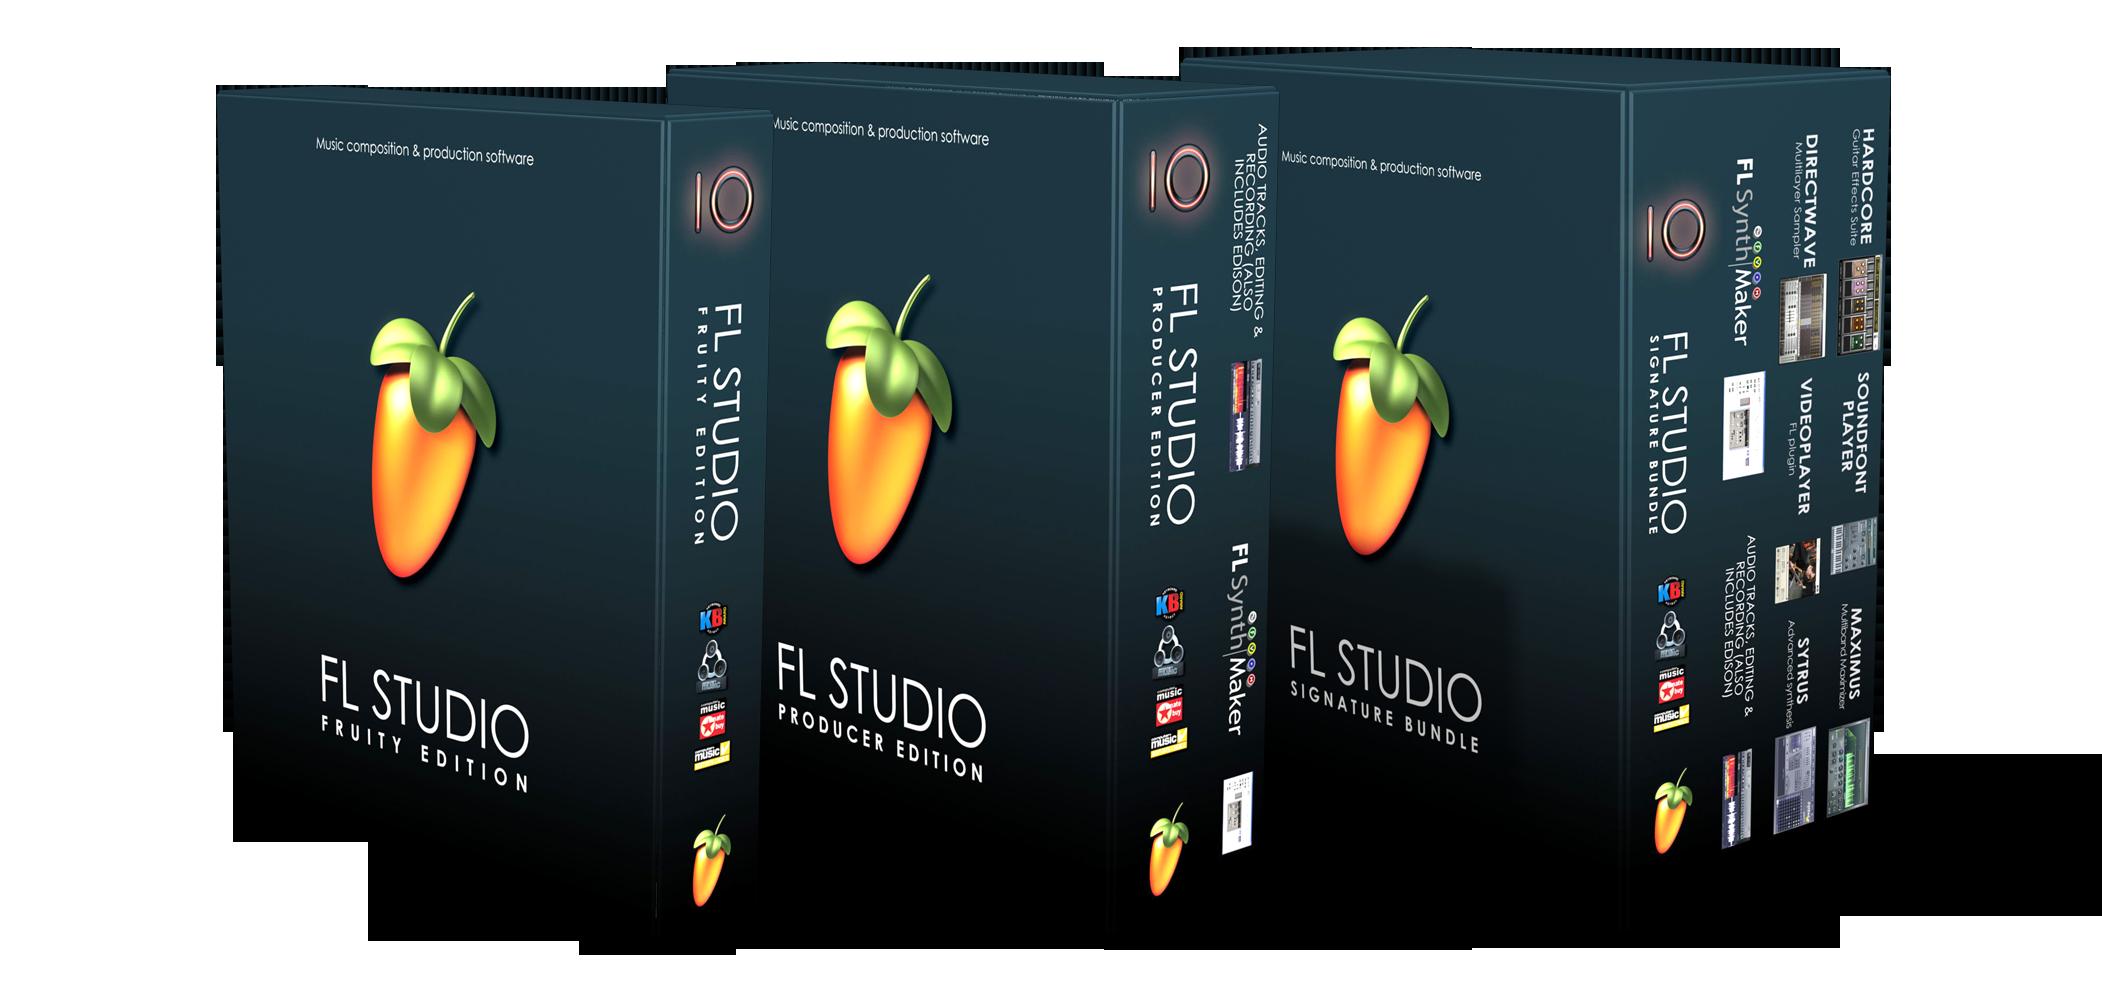 Image Line Software Announces Fl Studio 10 Audio